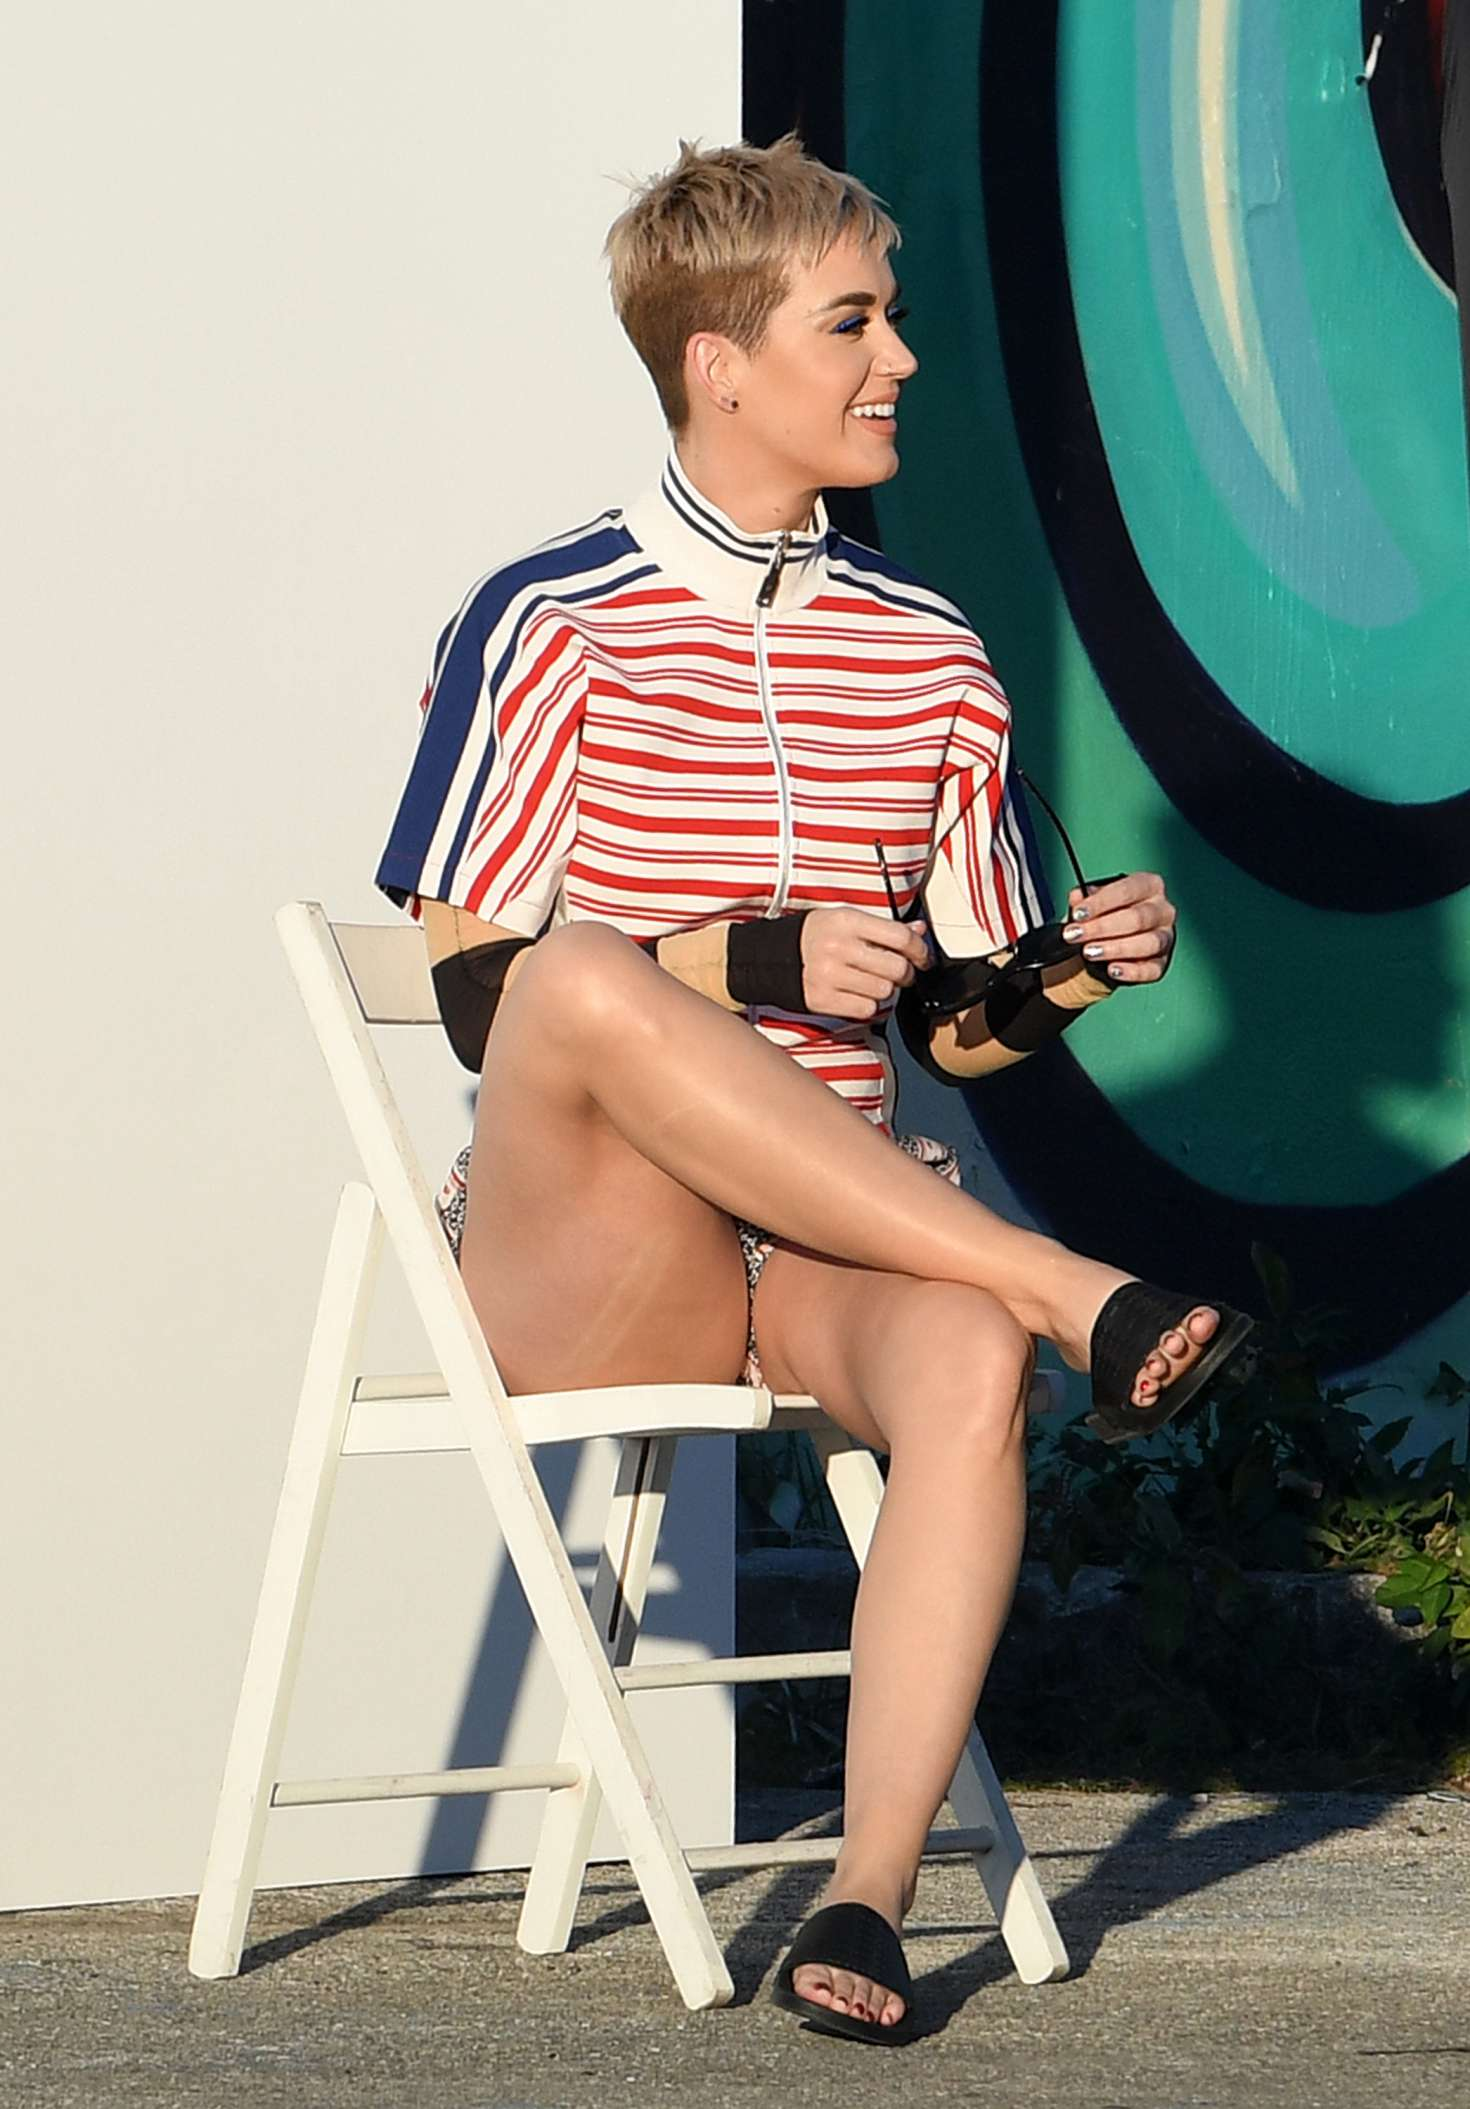 Katy Perry Photoshoot In Miami Indian Girls Villa